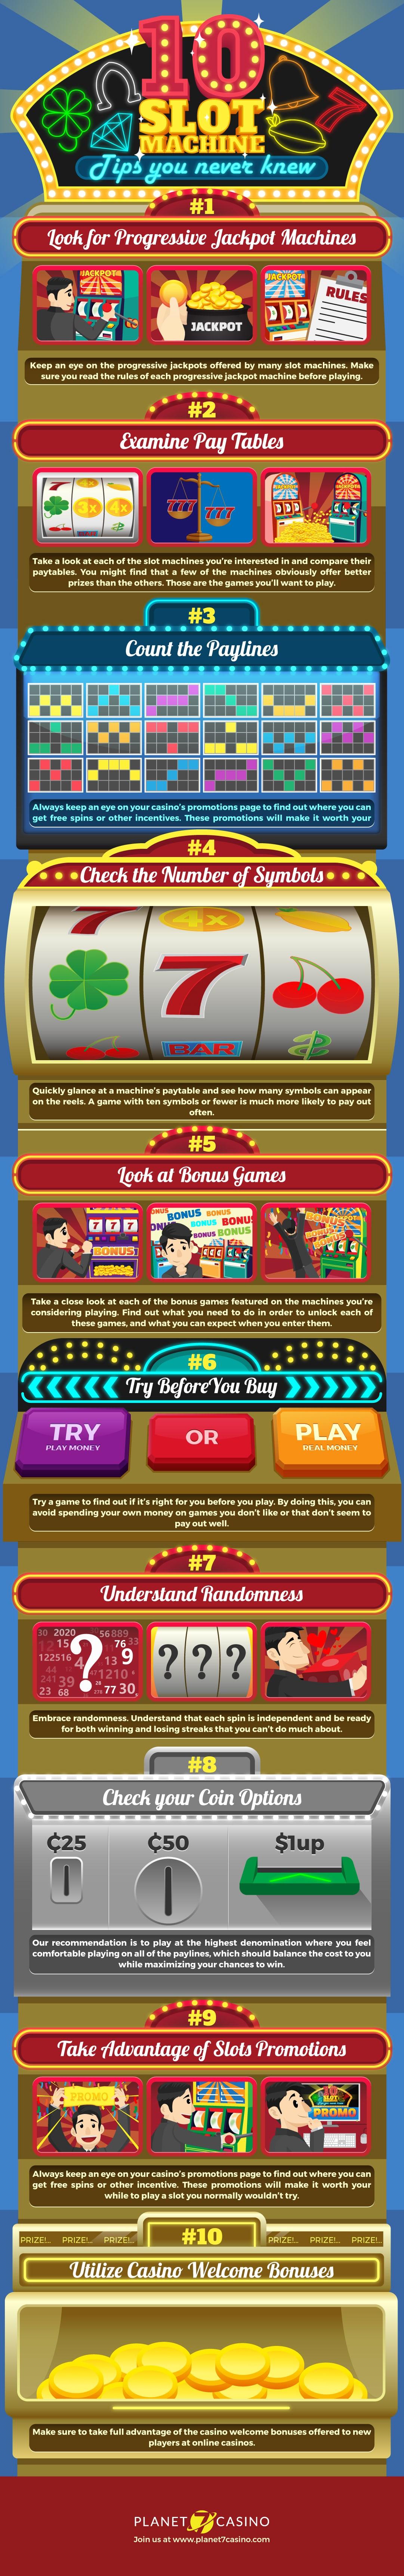 10 Slot Machine Secret Tips You Never Knew